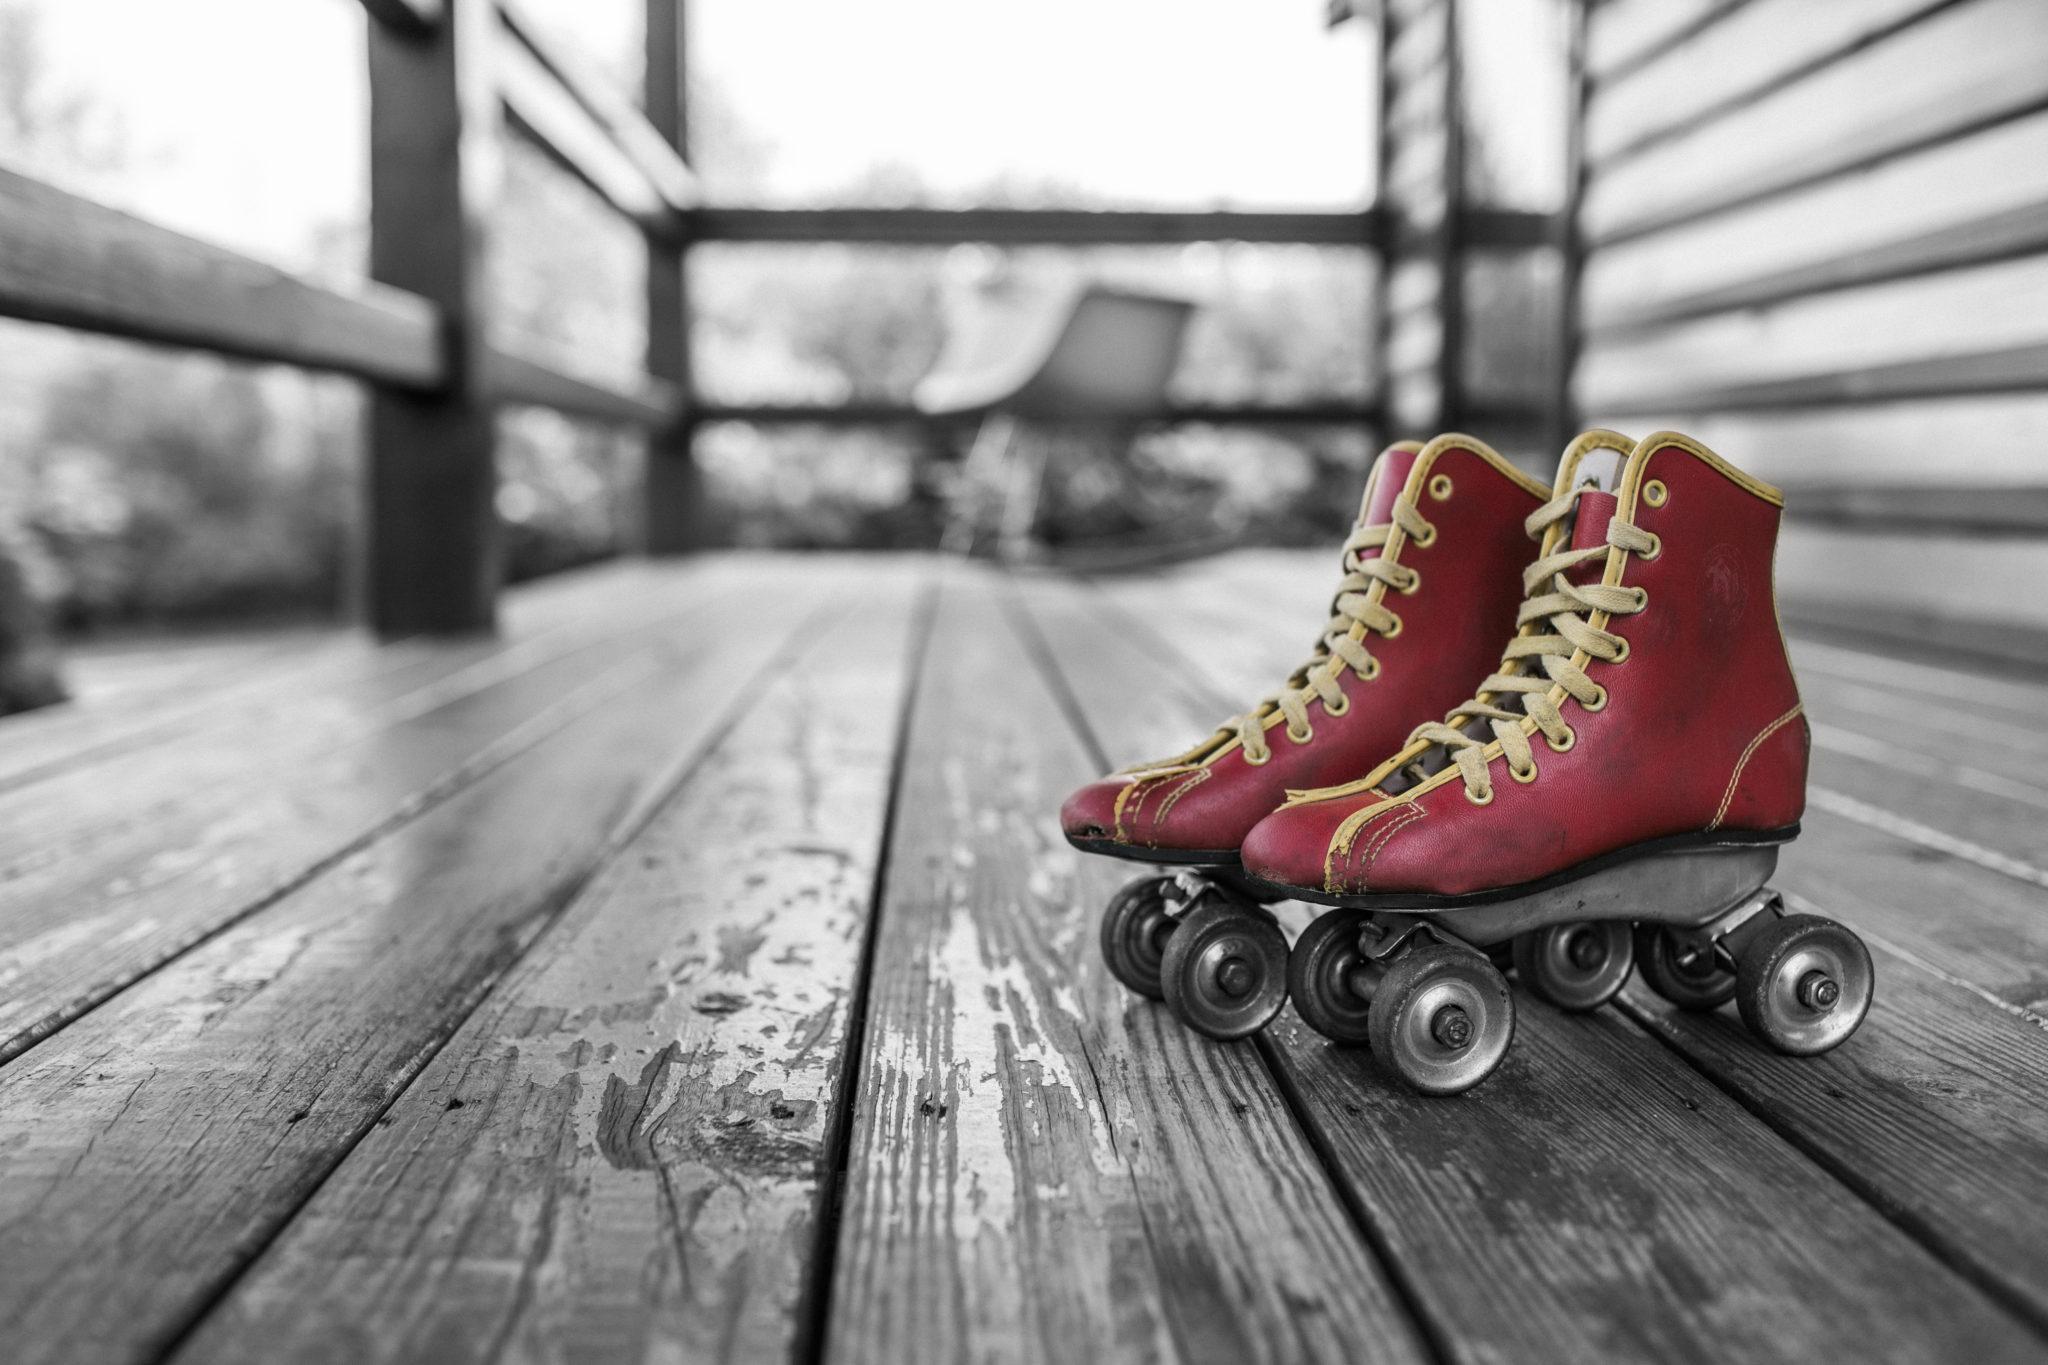 cd8d582b38e17 Top 10 Health Benefits of Roller Skating